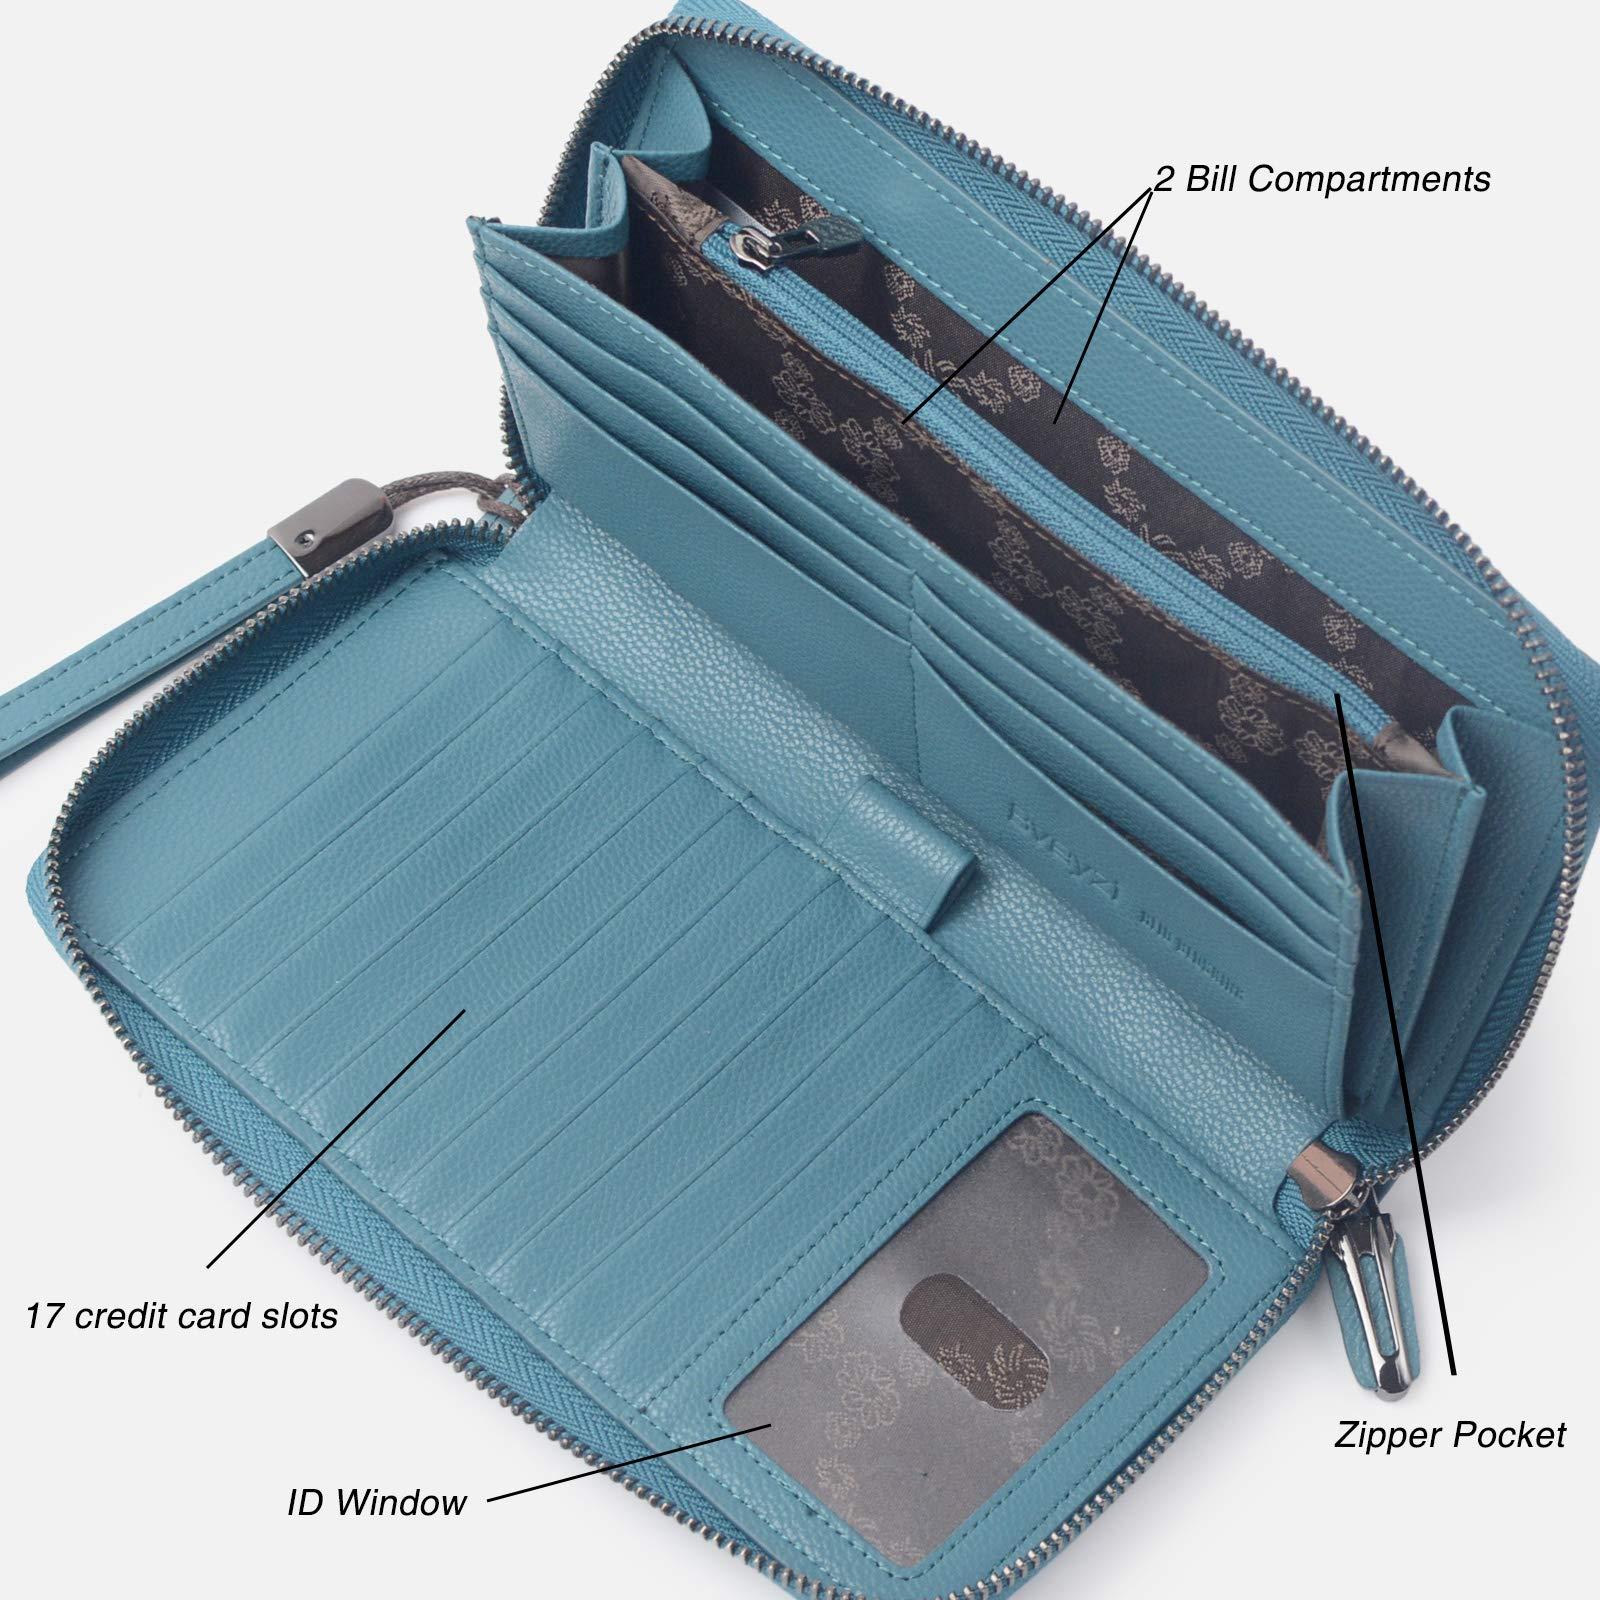 Women RFID Blocking Wallet Leather Zip Around Phone Clutch Large Travel Purse Wristlet (Lake Blue) by Bveyzi (Image #4)